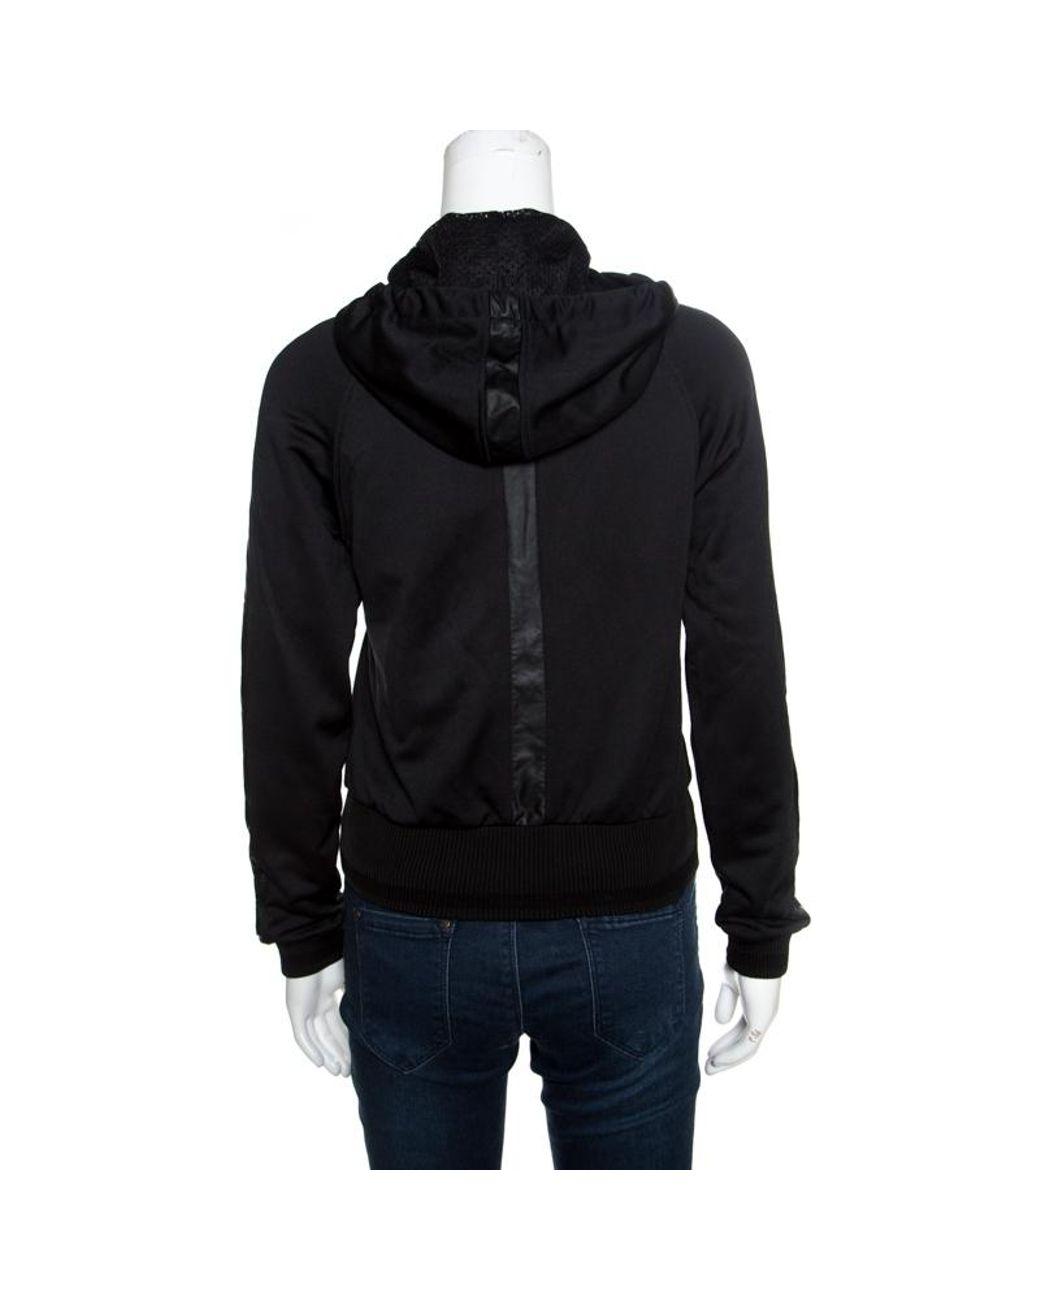 ac8910fa596 Roberto Cavalli Gym Black Knit Faux Leather Trim Hooded Sweatshirt S in  Black - Lyst